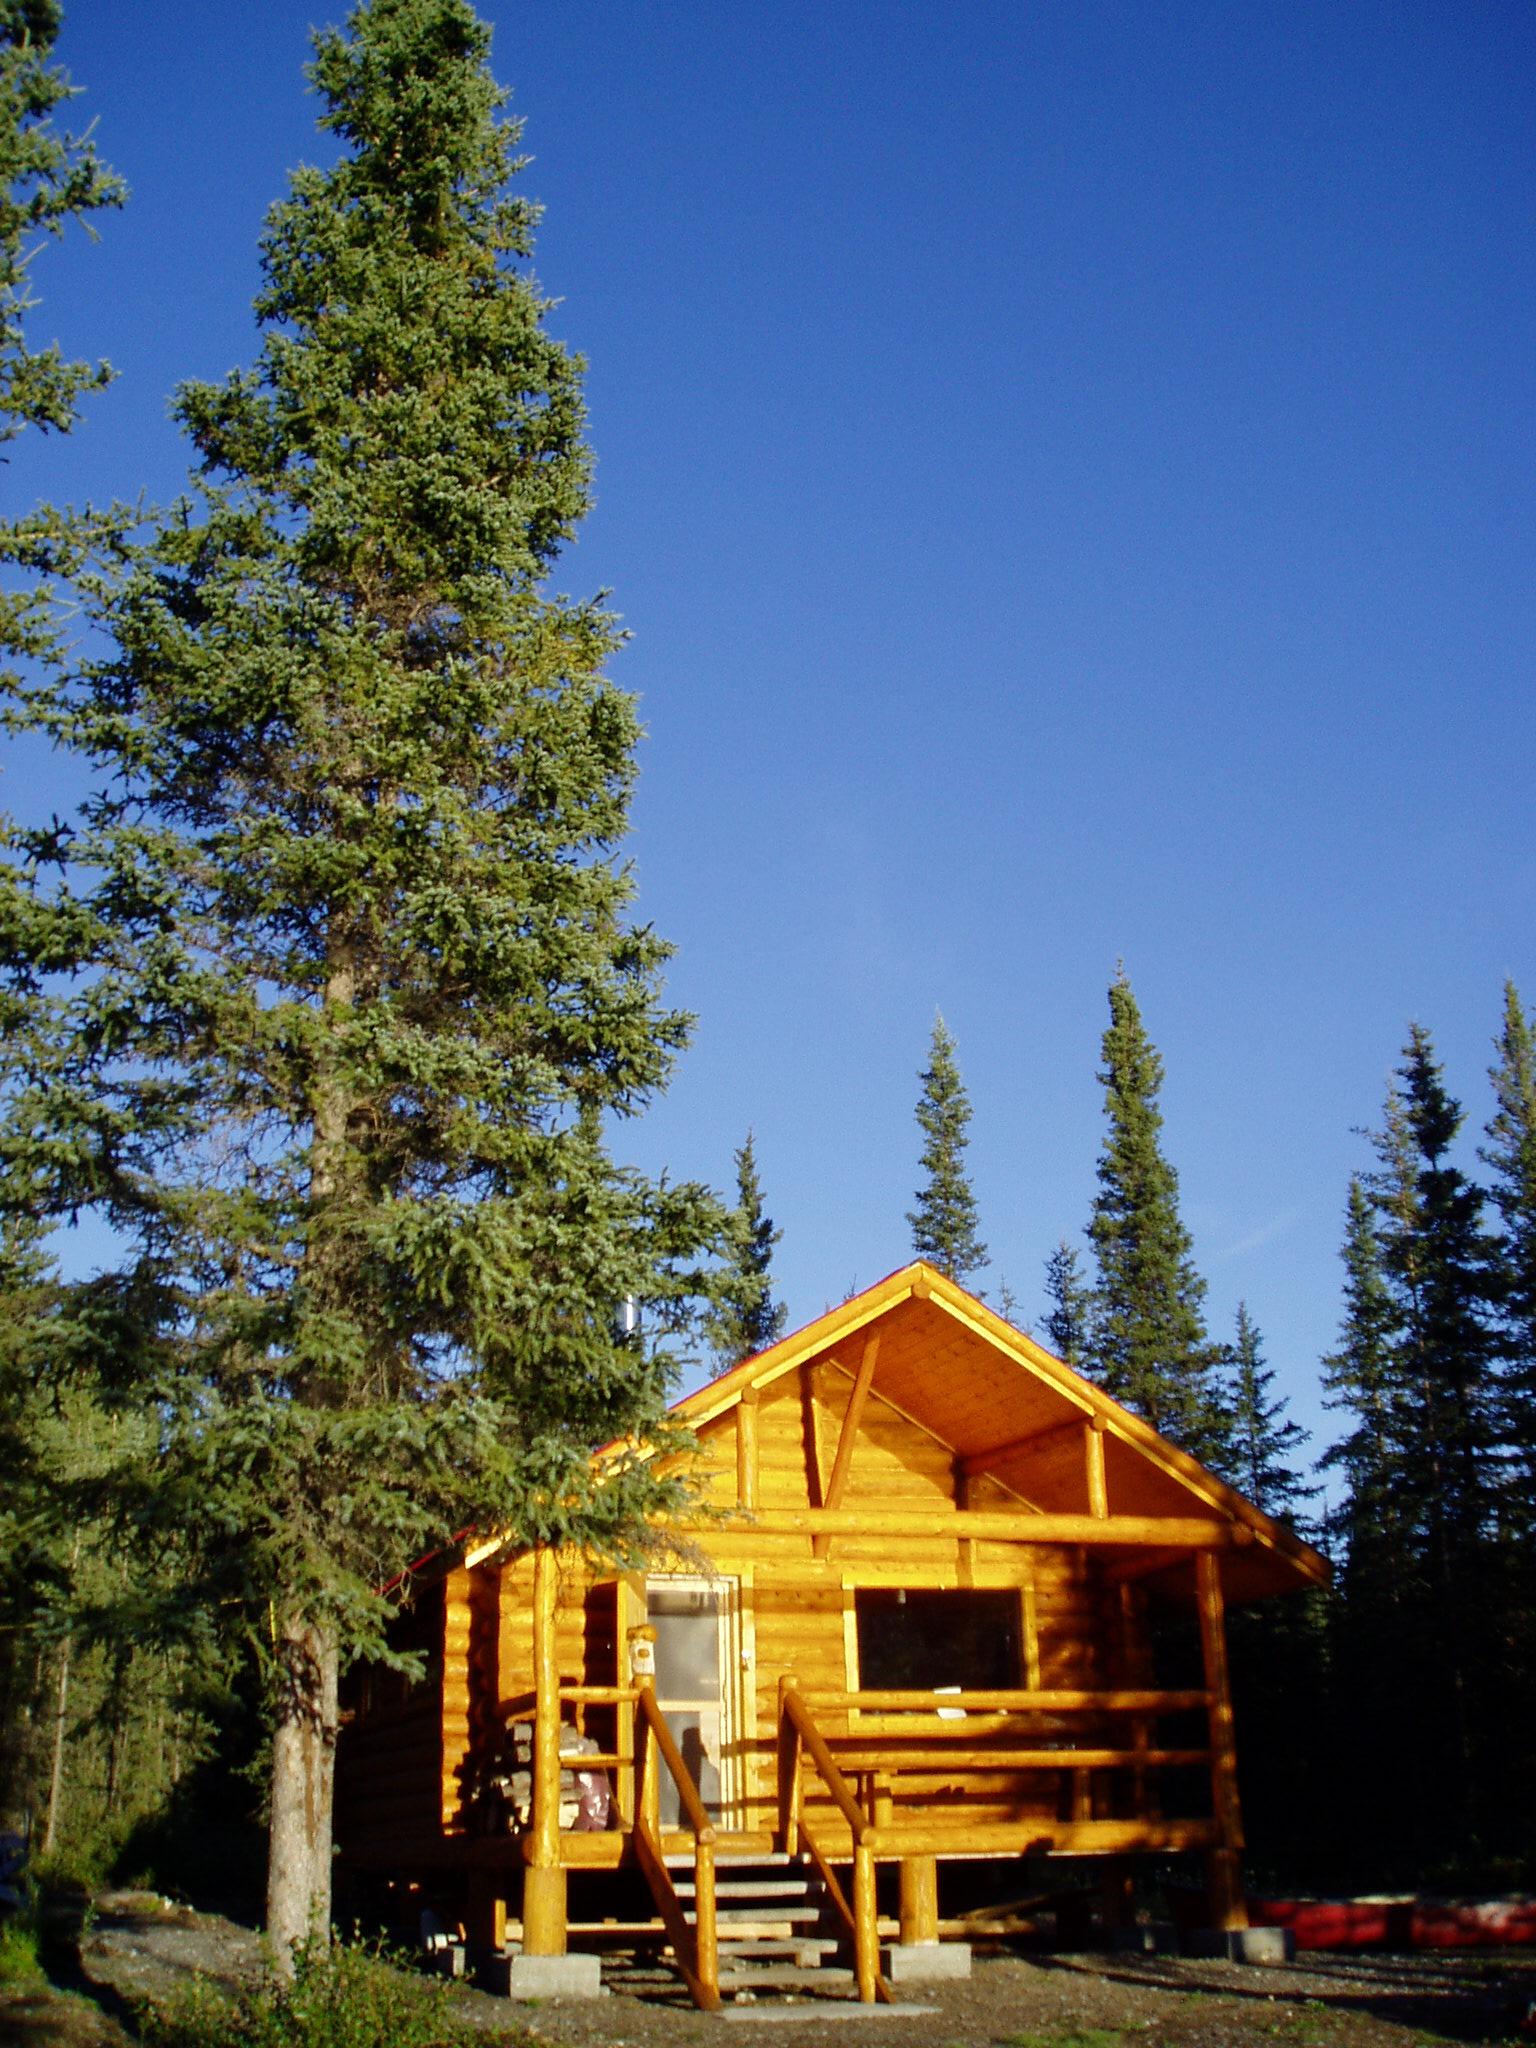 Copy of Netson lake Outpost cabin